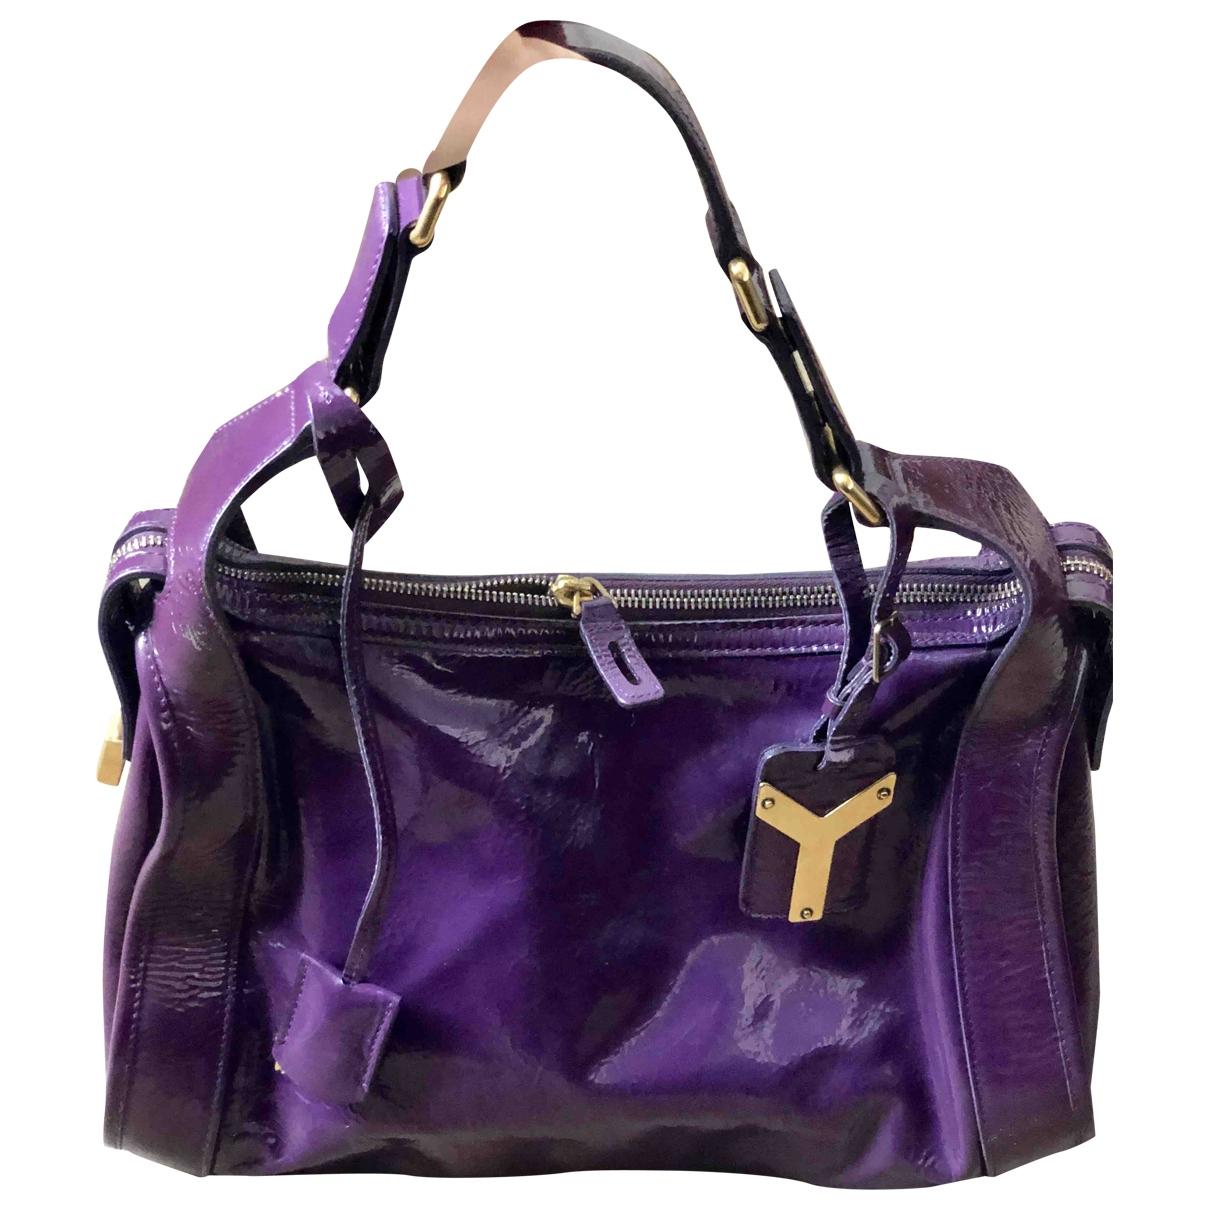 Saint Laurent \N Purple Patent leather handbag for Women \N